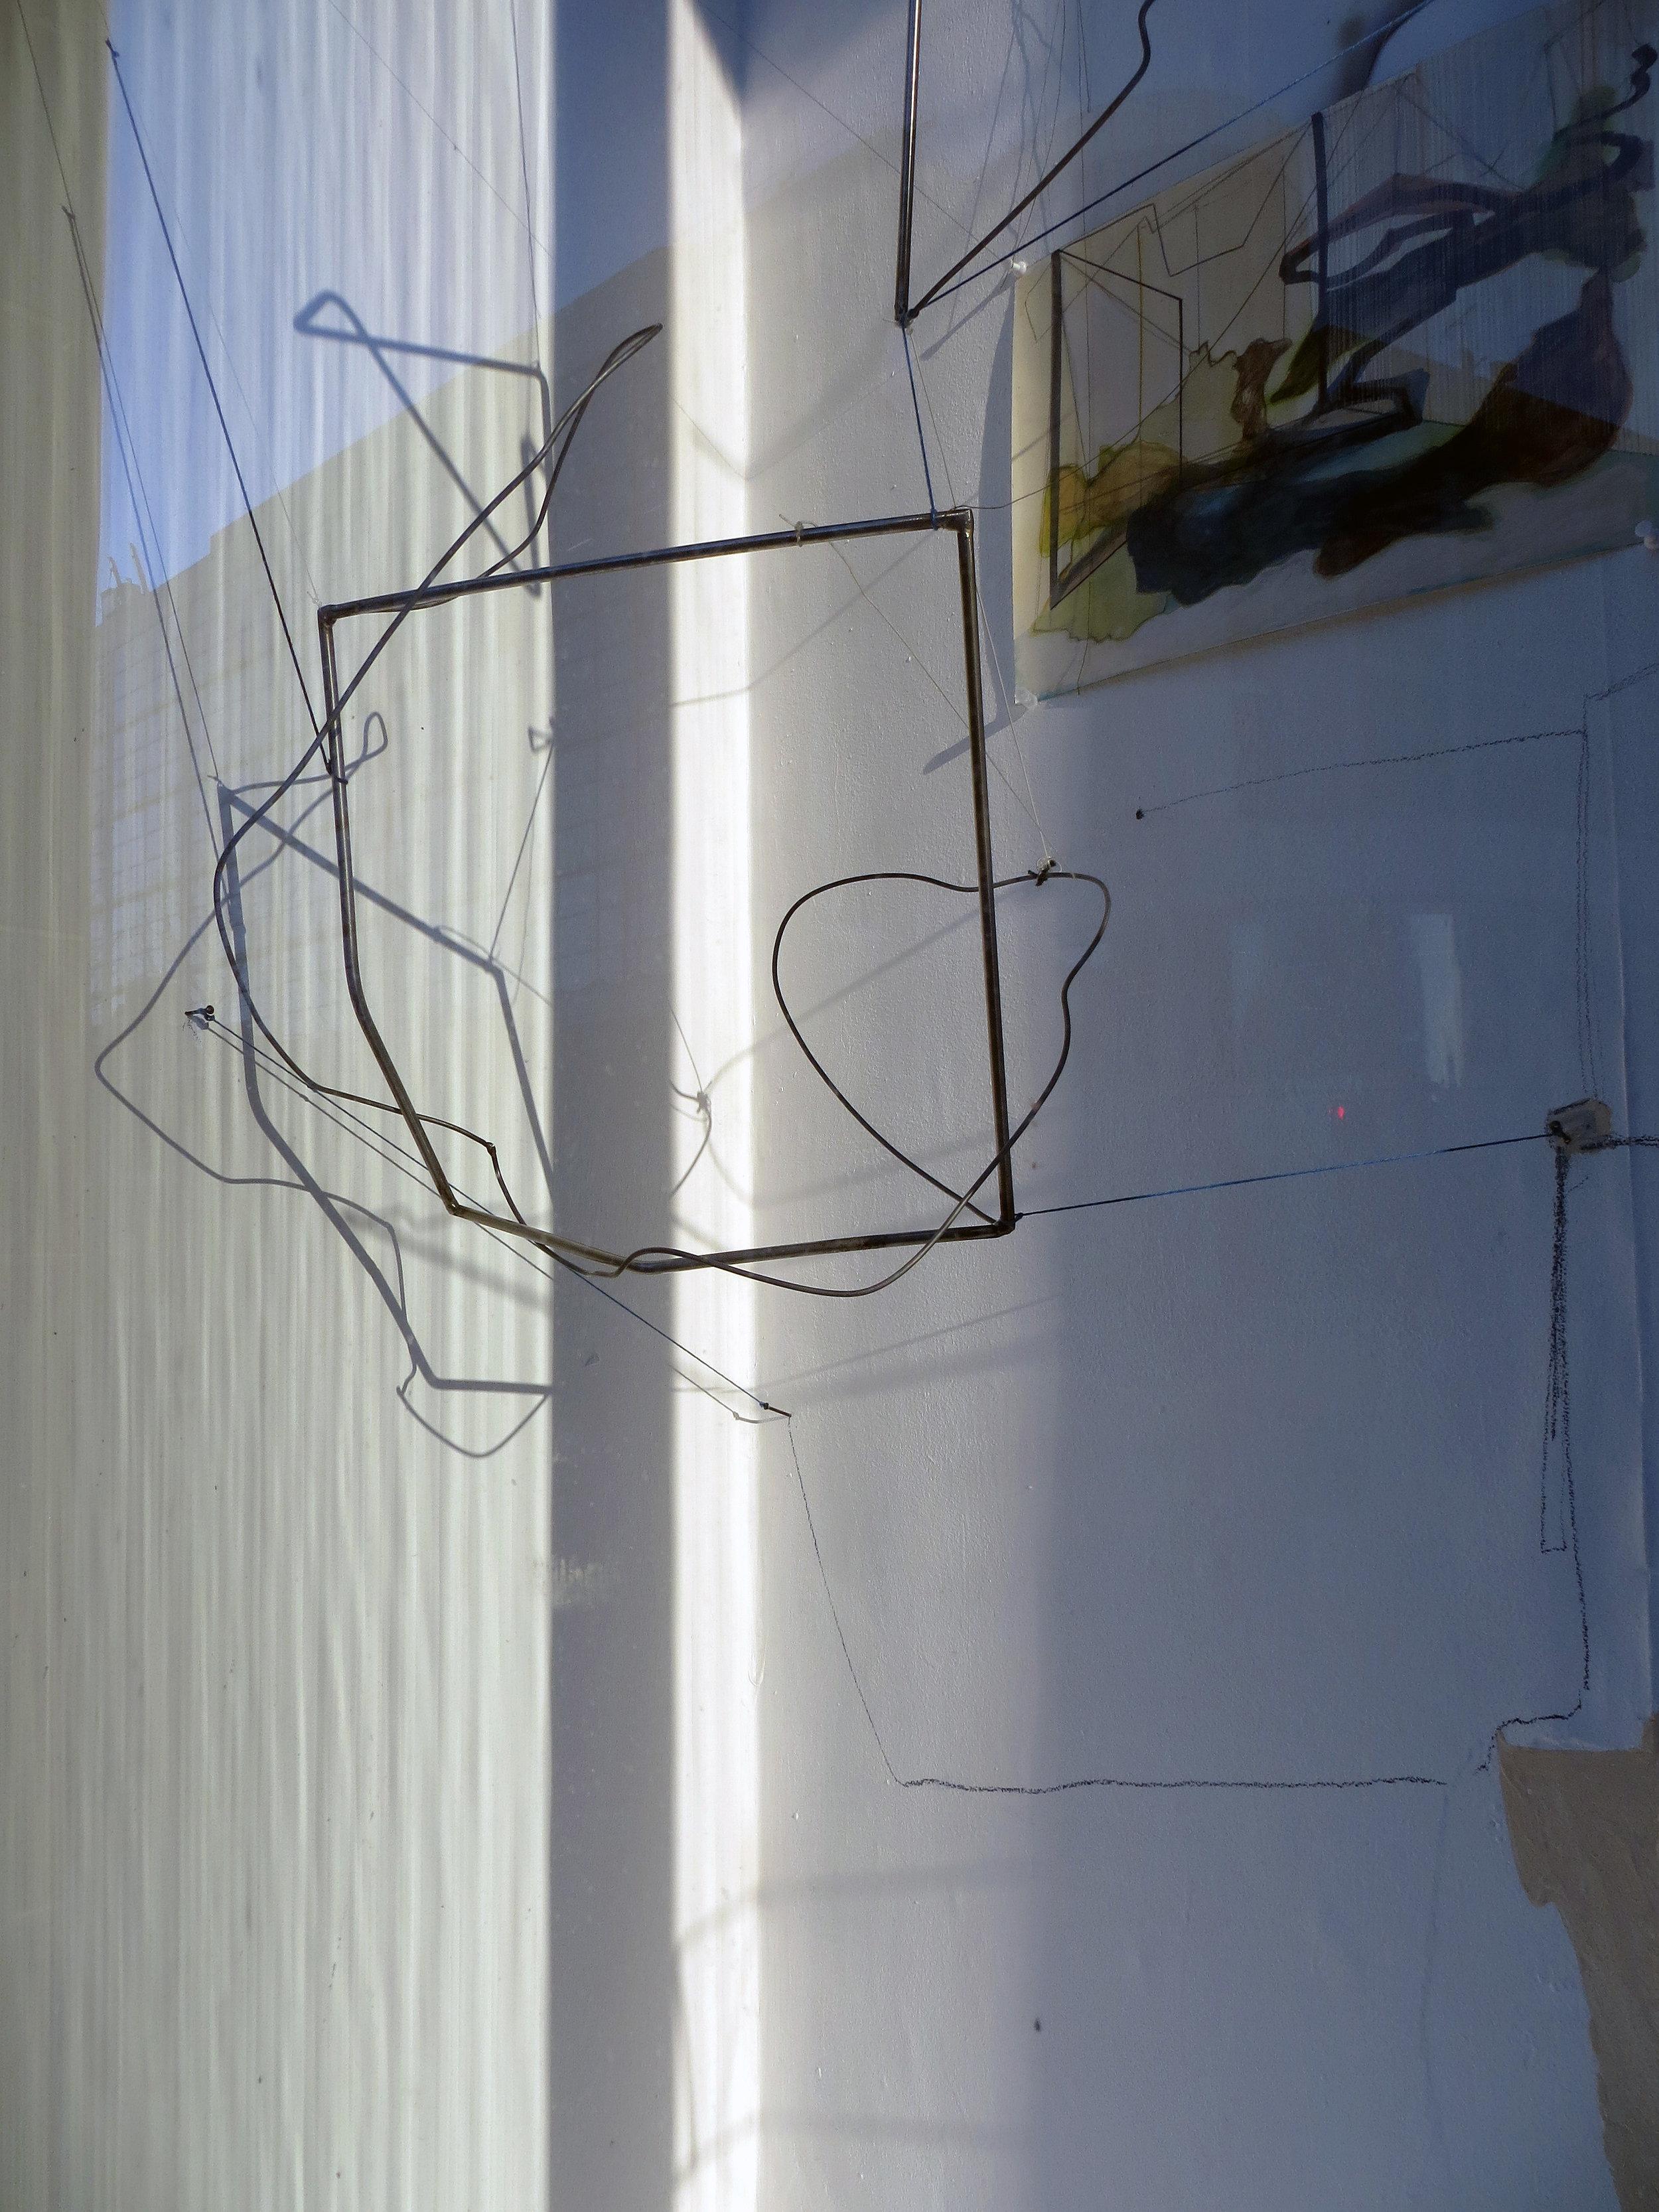 anna lytridou_window detail.jpg